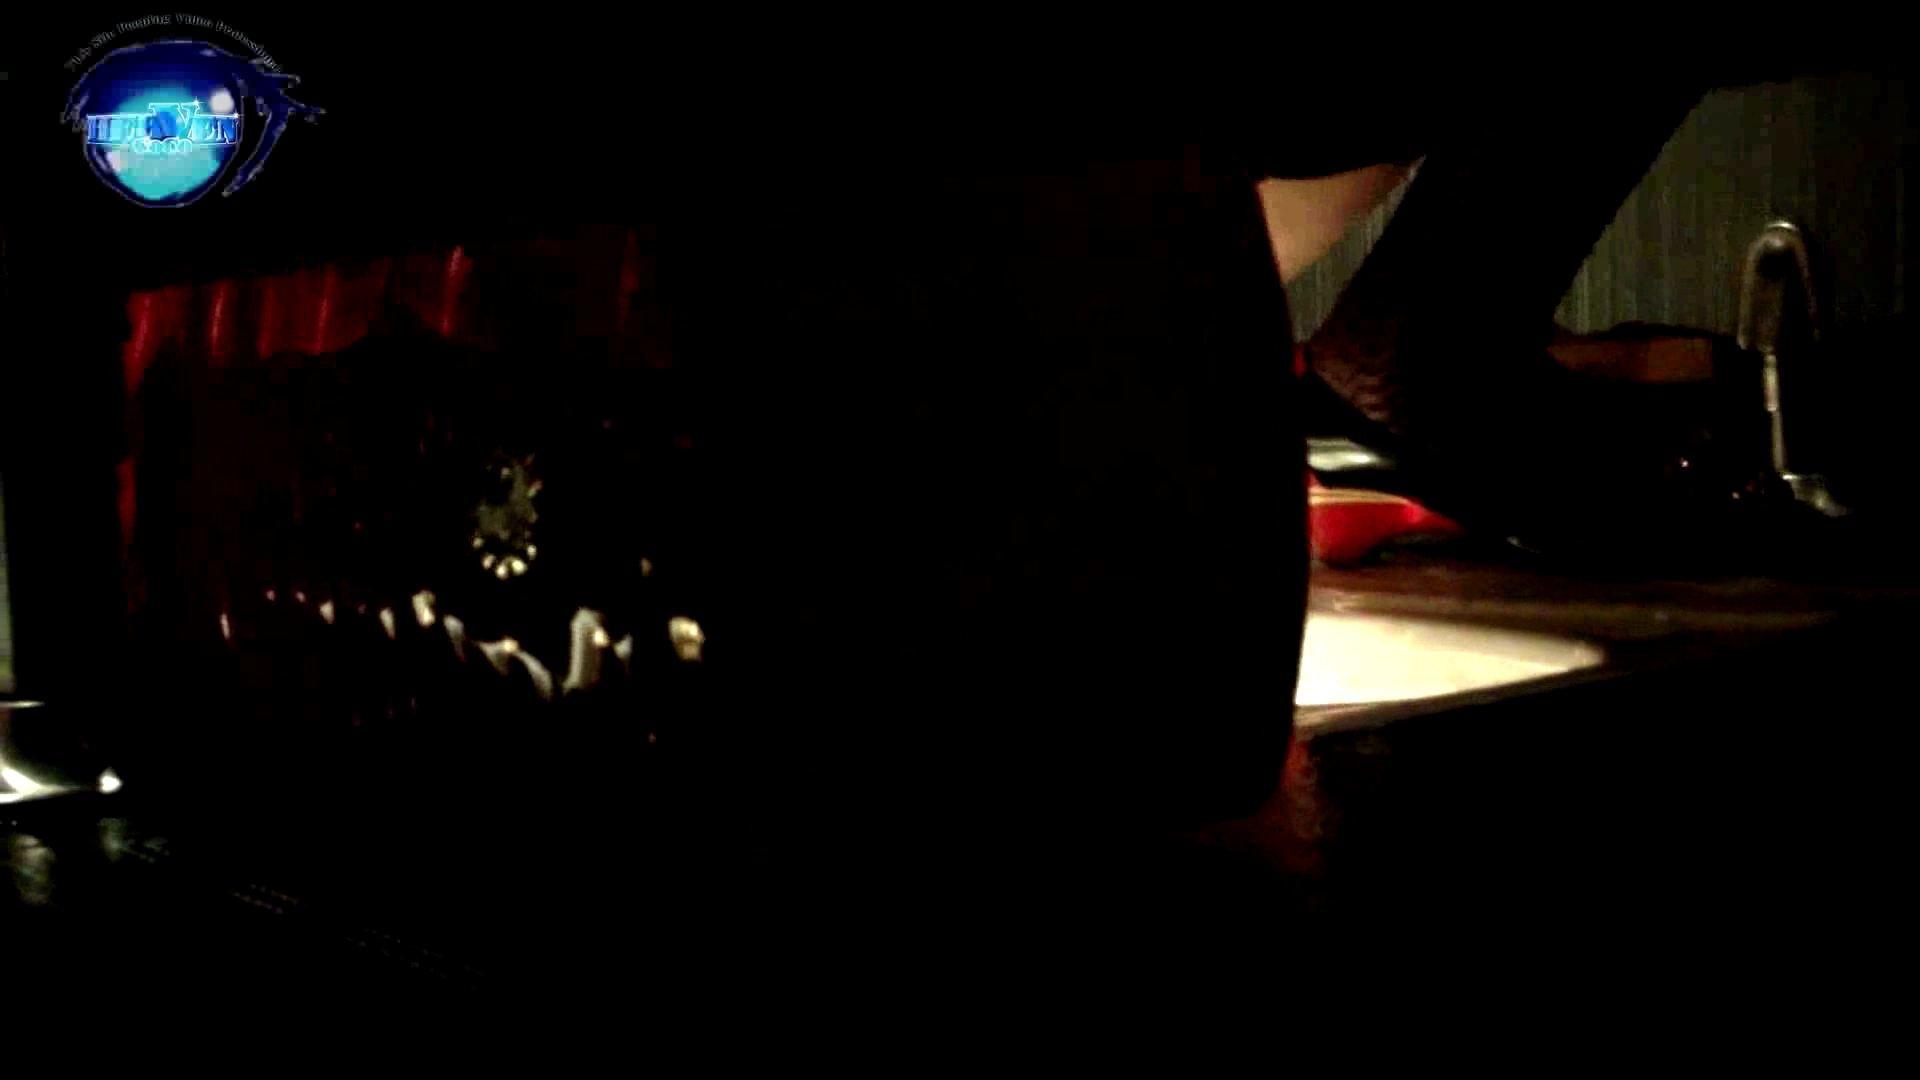 GOD HAND ファッションショッピングセンター盗撮vol.06 OLのエロ生活 | 盗撮  51連発 4